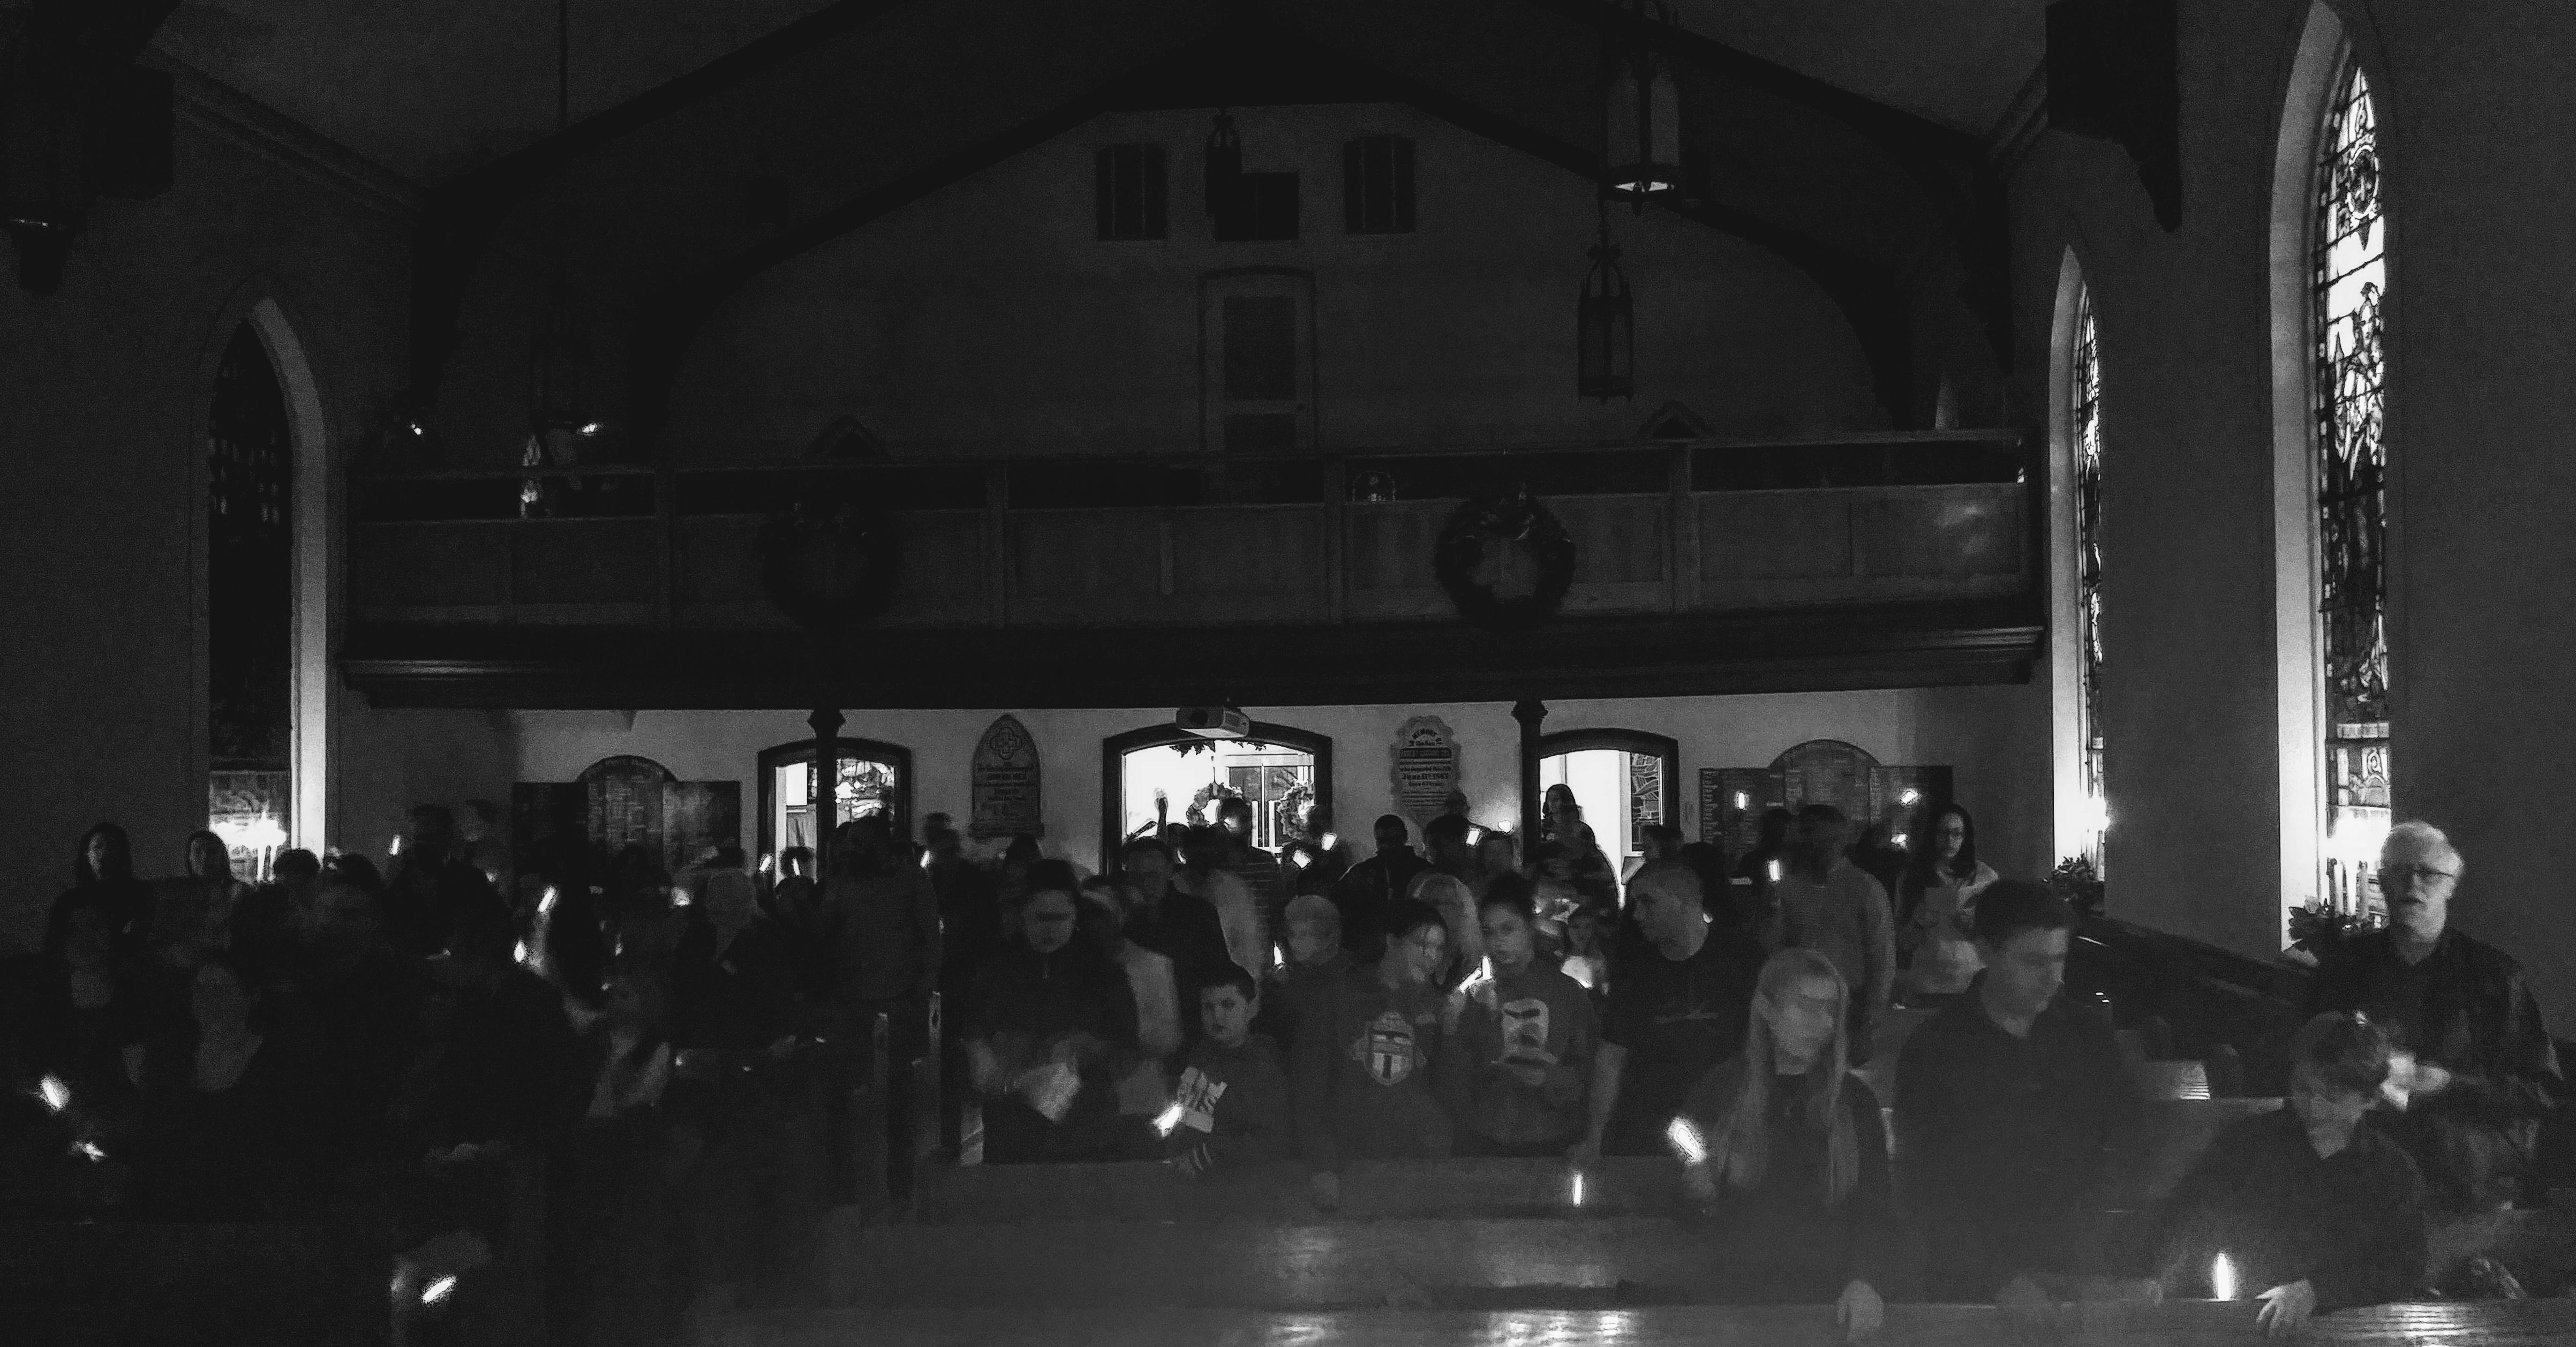 Candle Light & Glow Sticks @ 5:00 pm